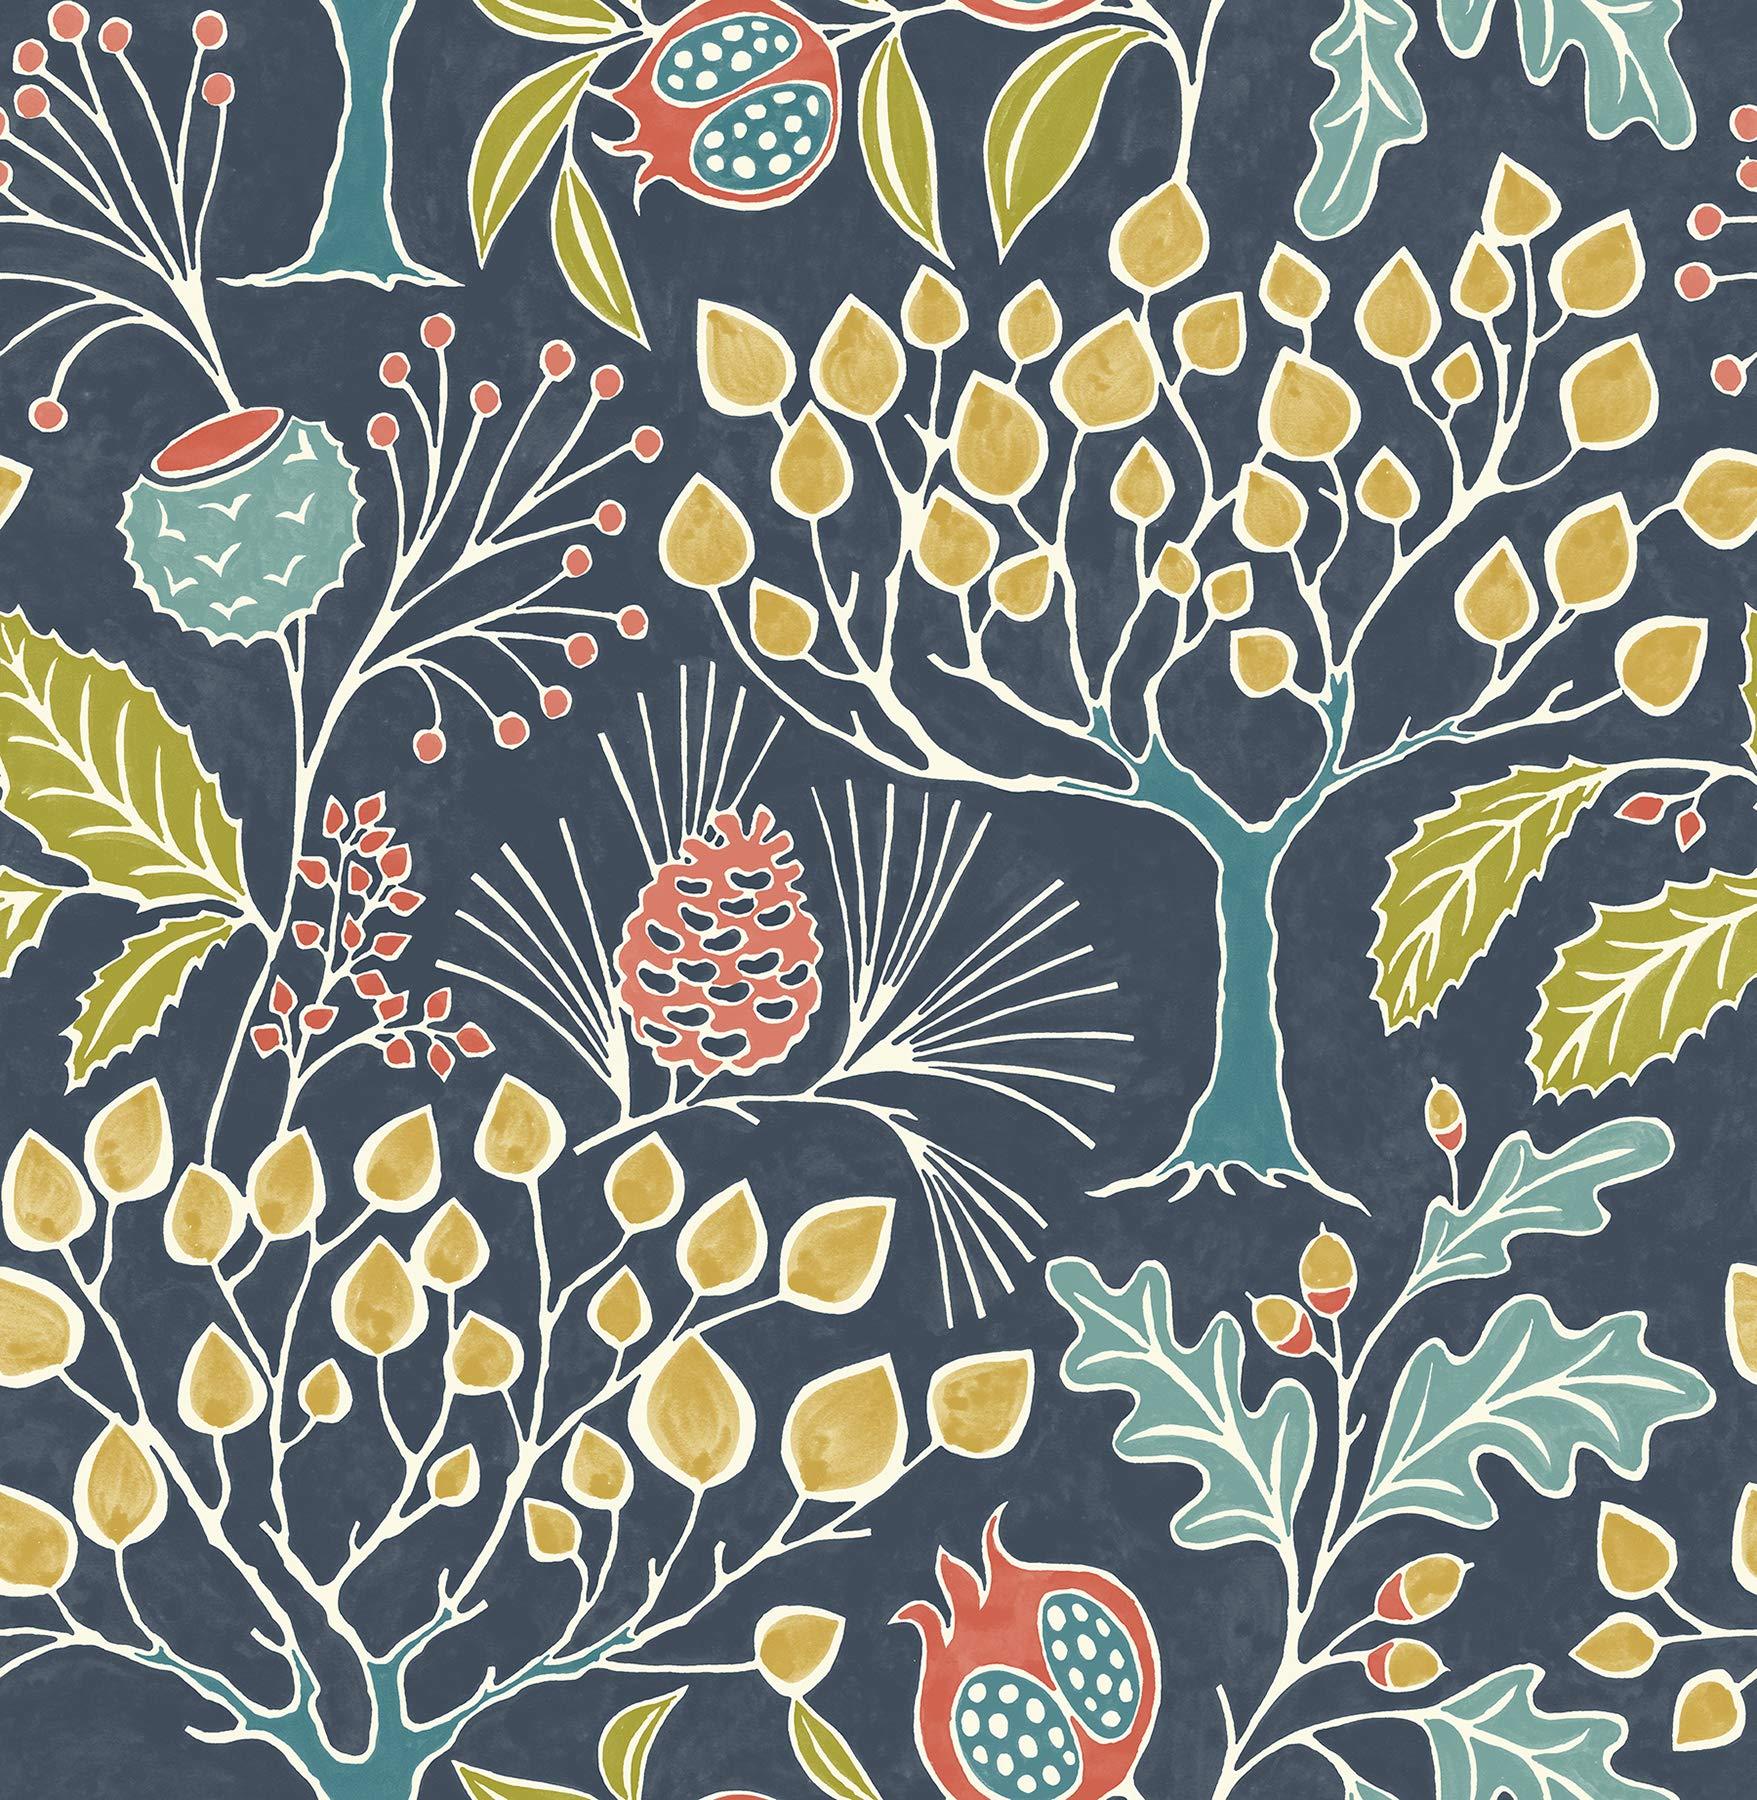 NuWallpaper NU3038 Groovy Garden Navy Peel & Stick Wallpaper, Multicolor by NuWallpaper